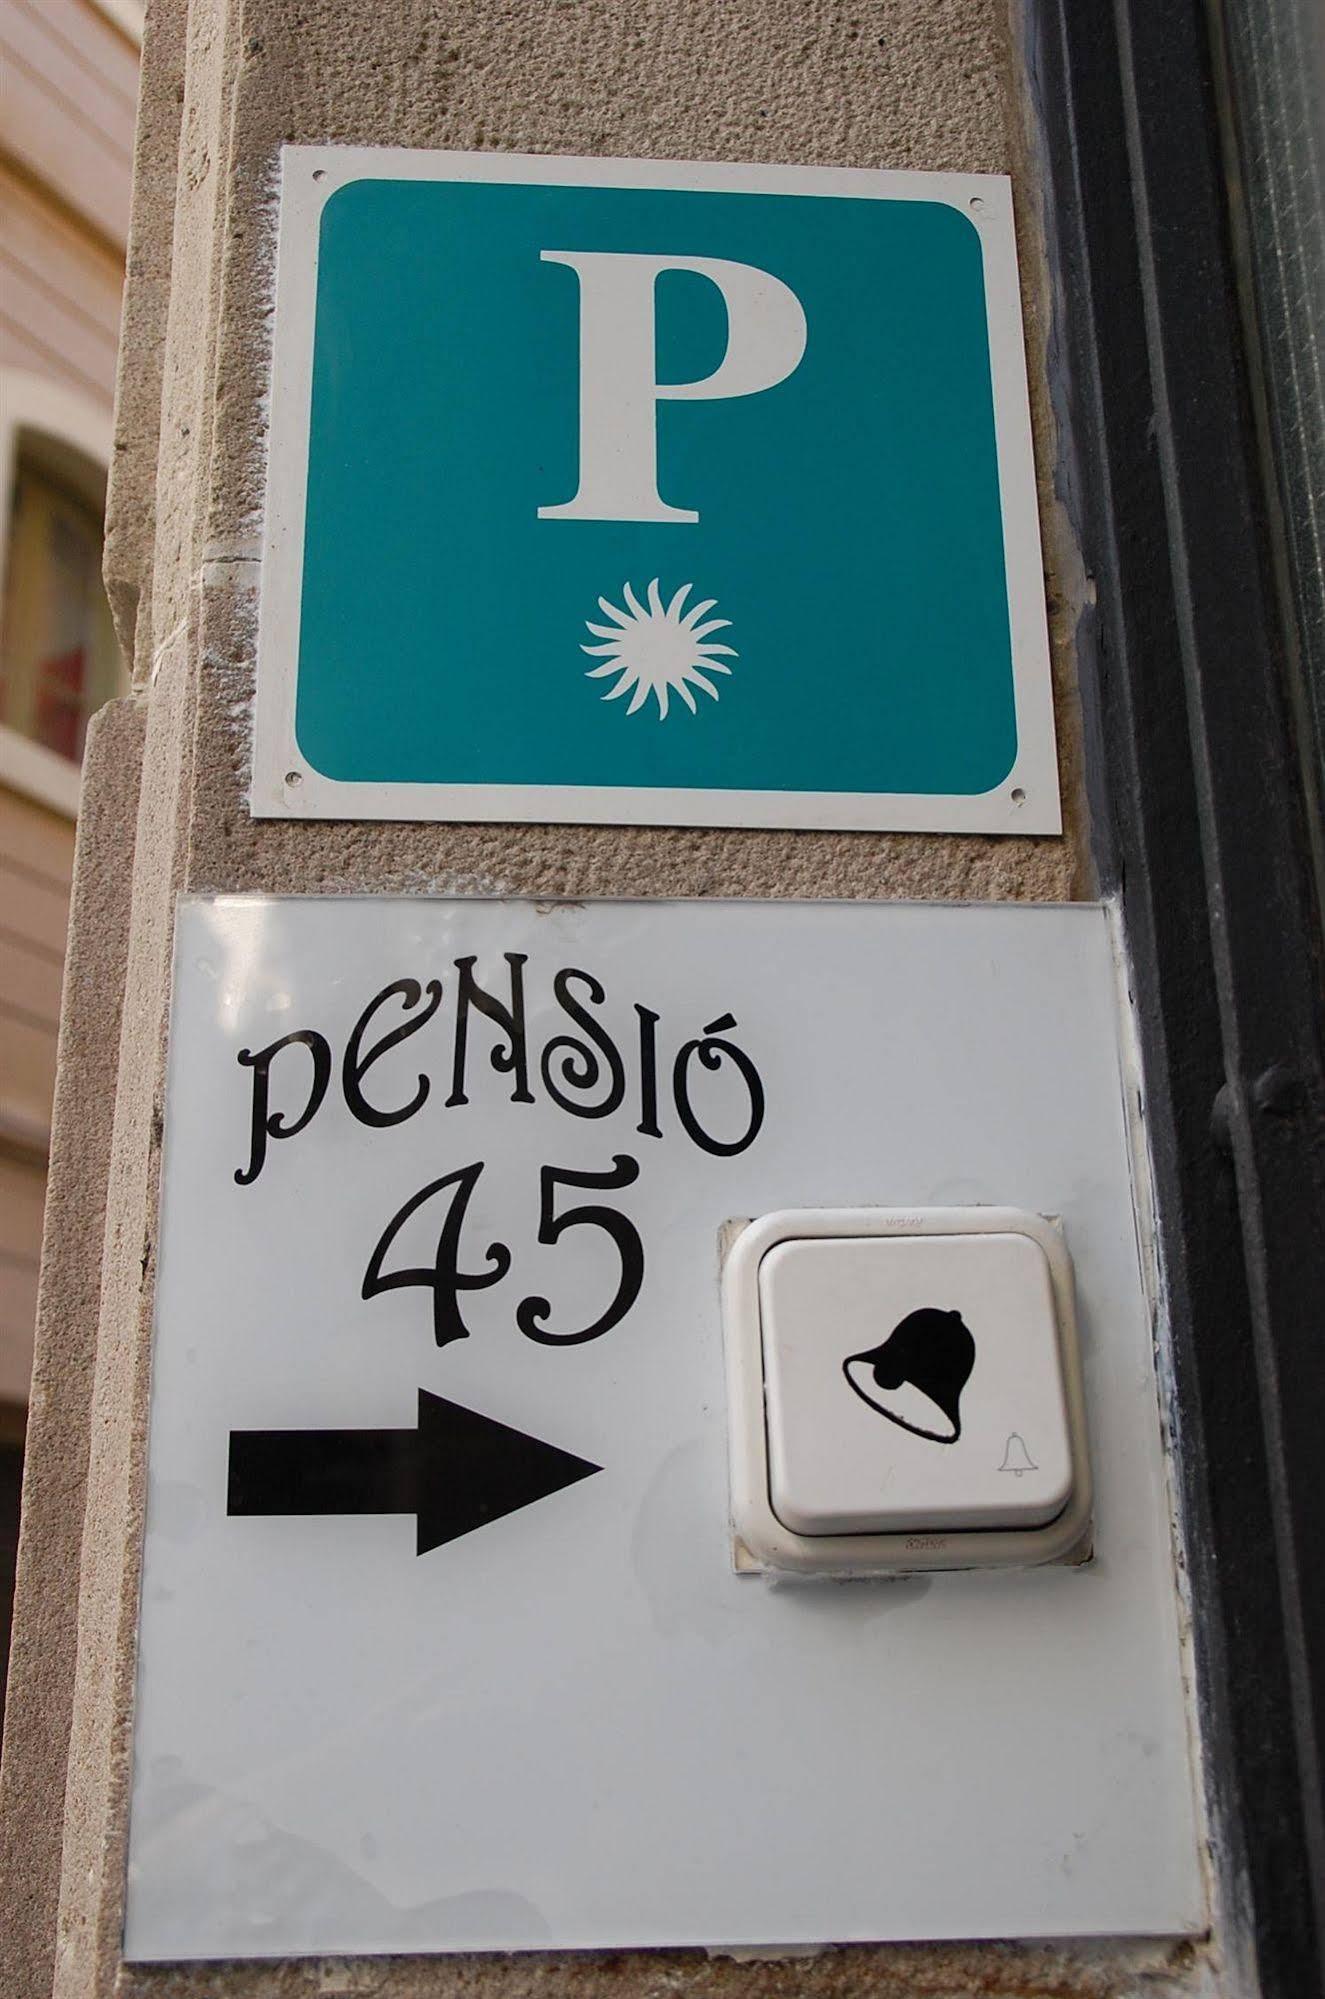 Pension 45